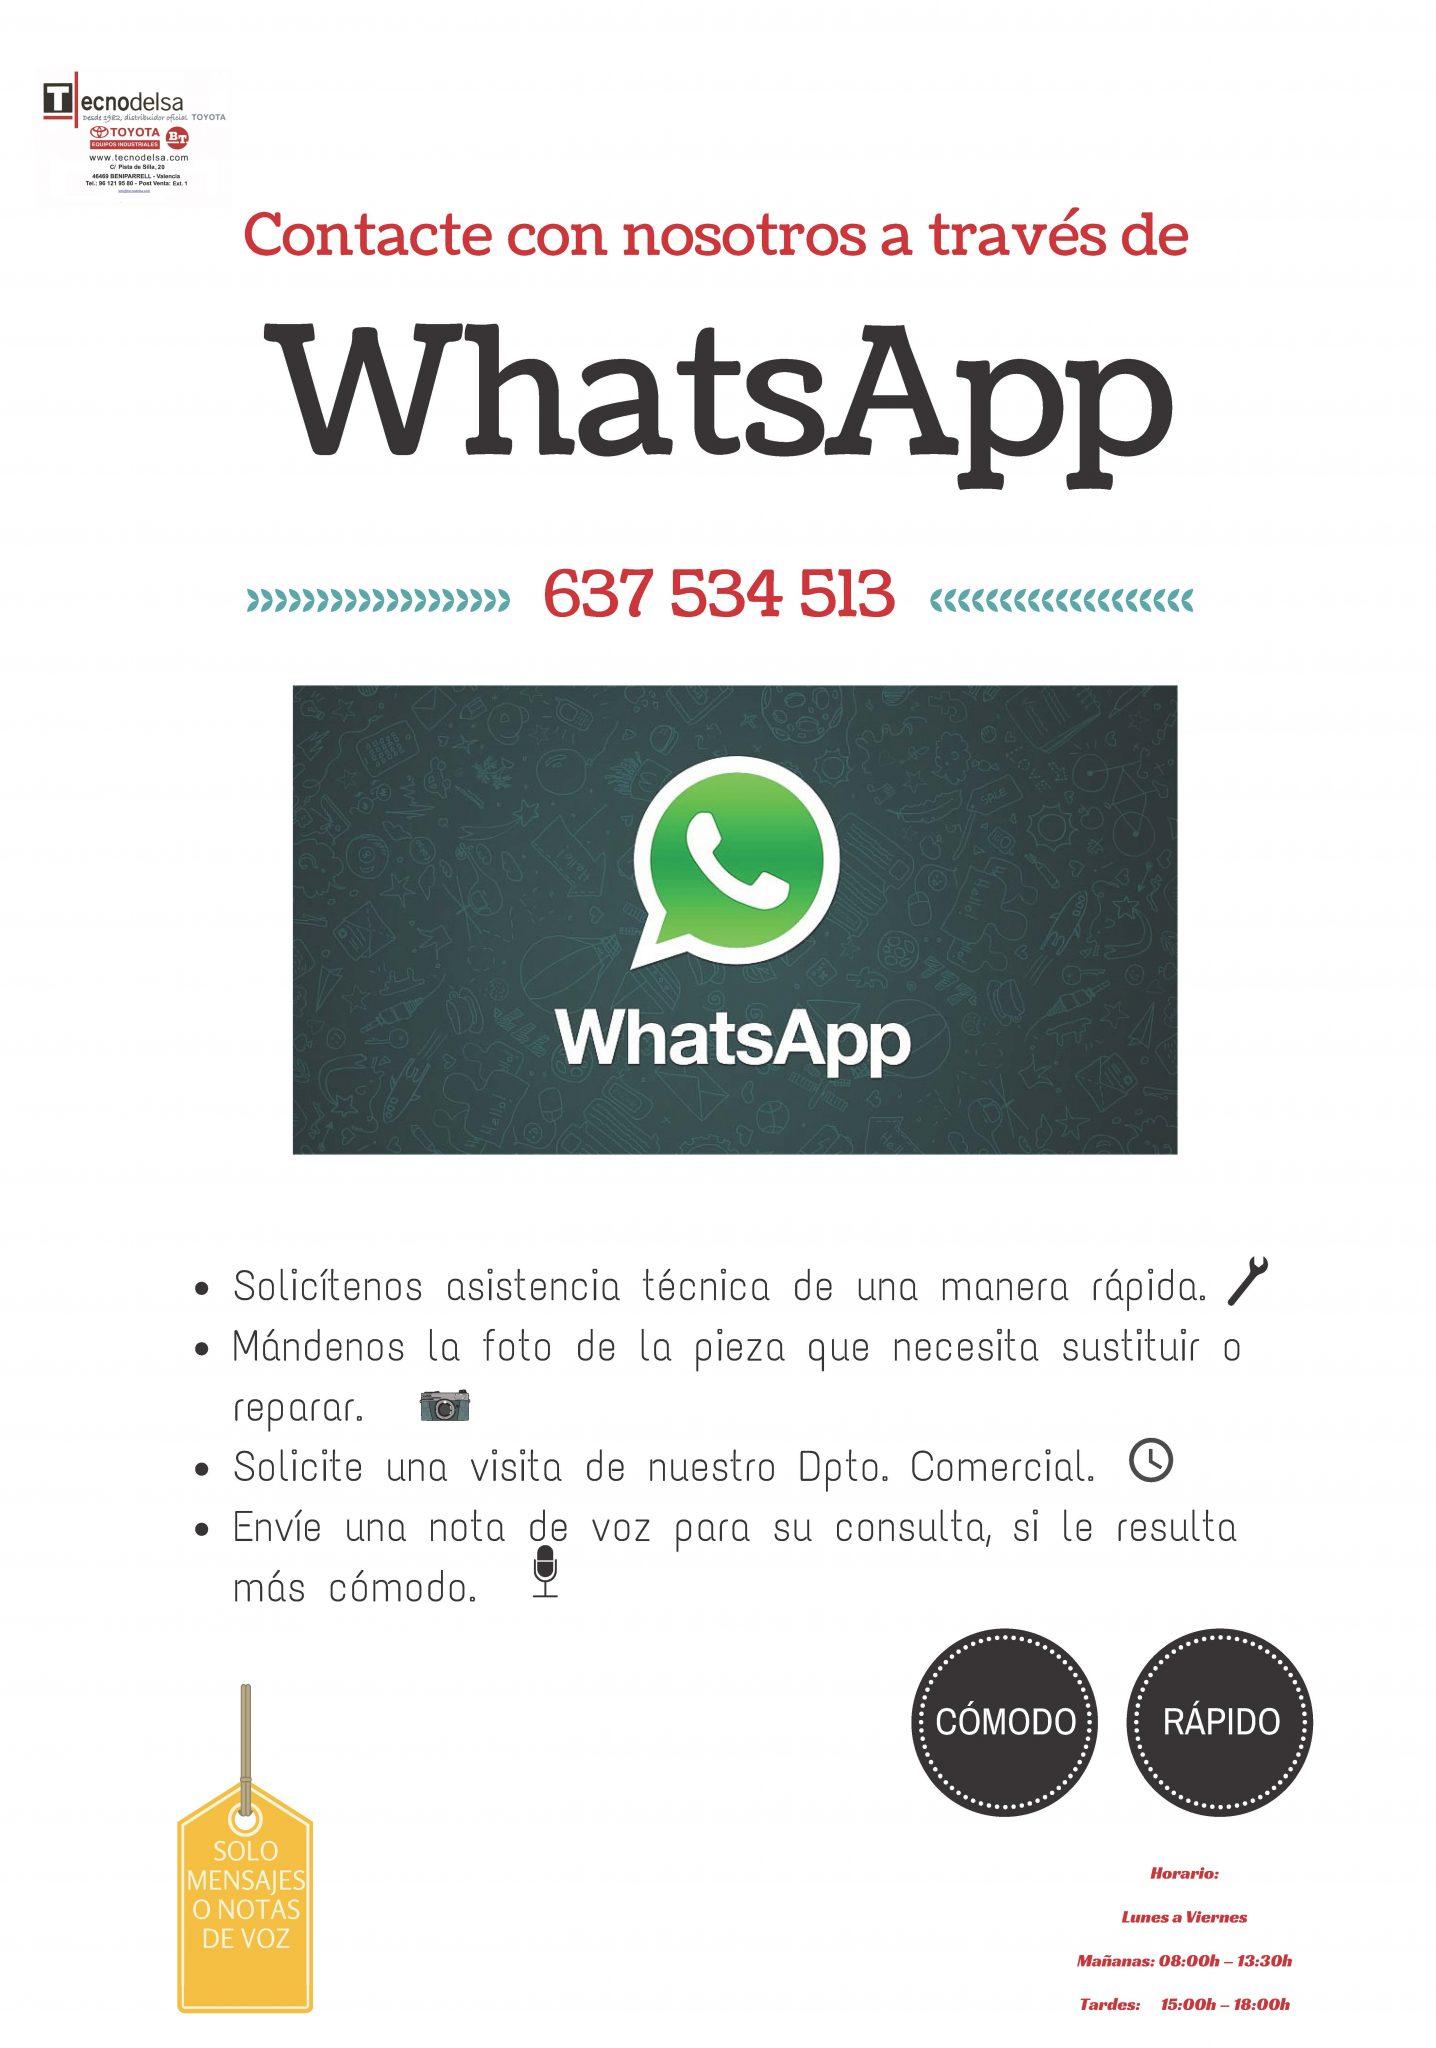 Contacte con Tecnodelsa por WhatsApp